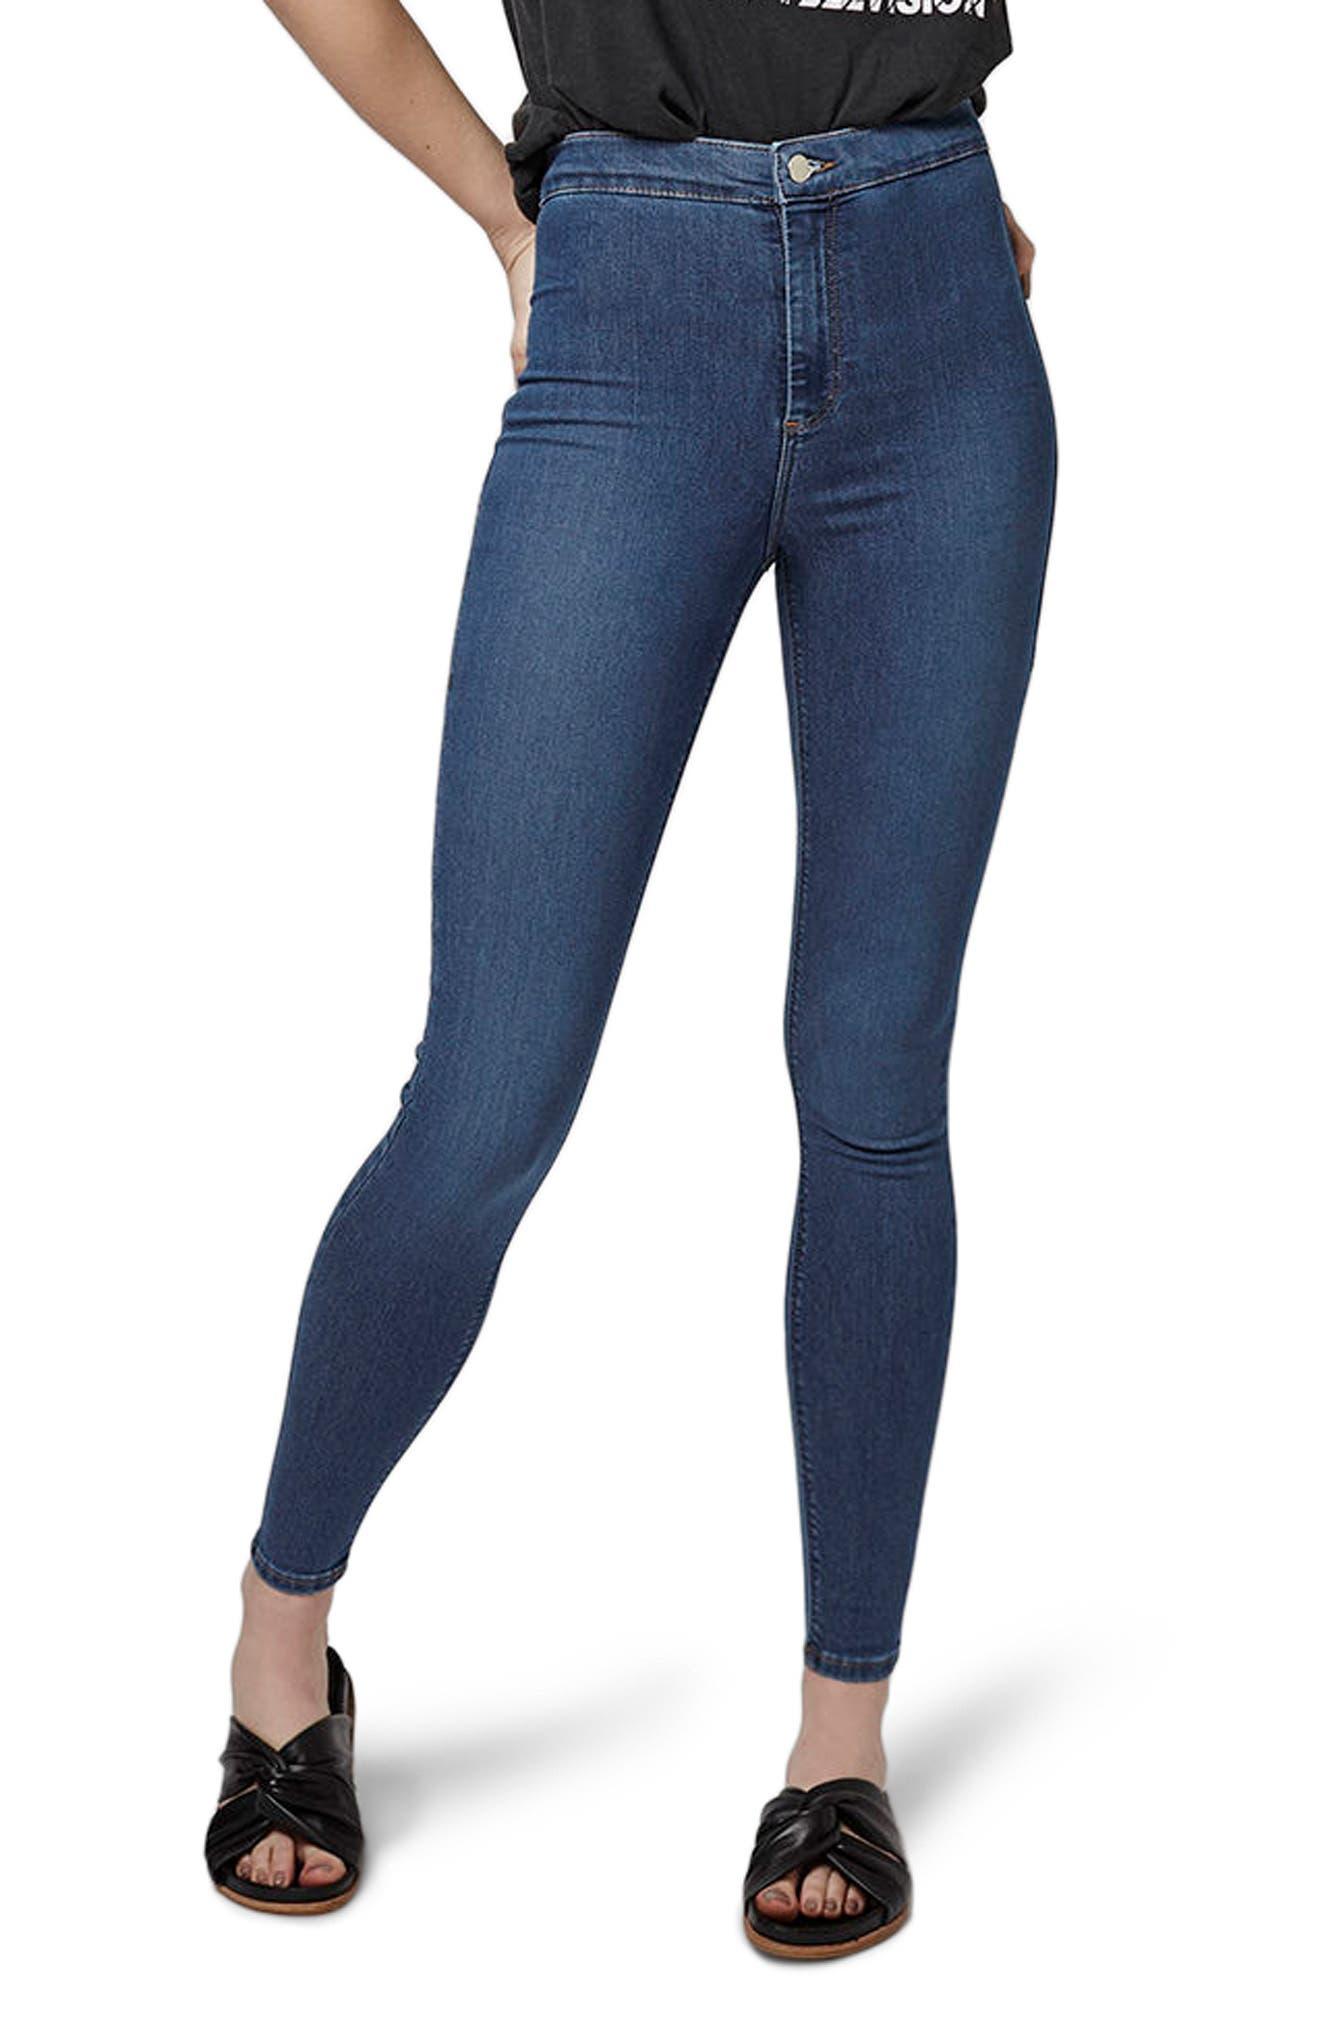 Main Image - Topshop Joni Mid Denim Jeans